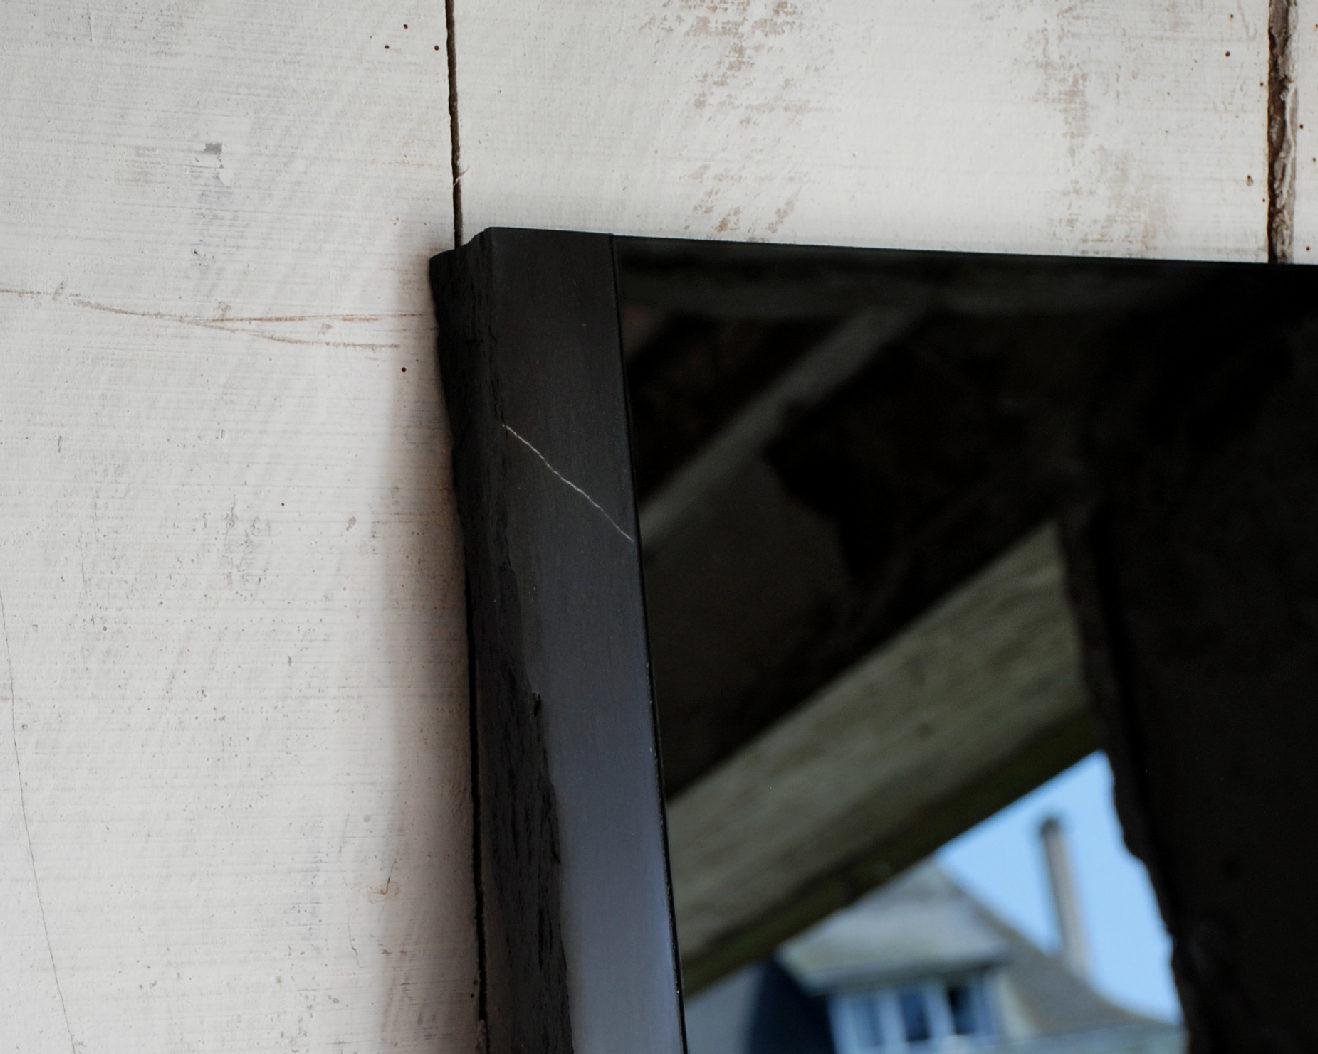 Narcisse-Miroir-Frederic-Saulou-Design-2